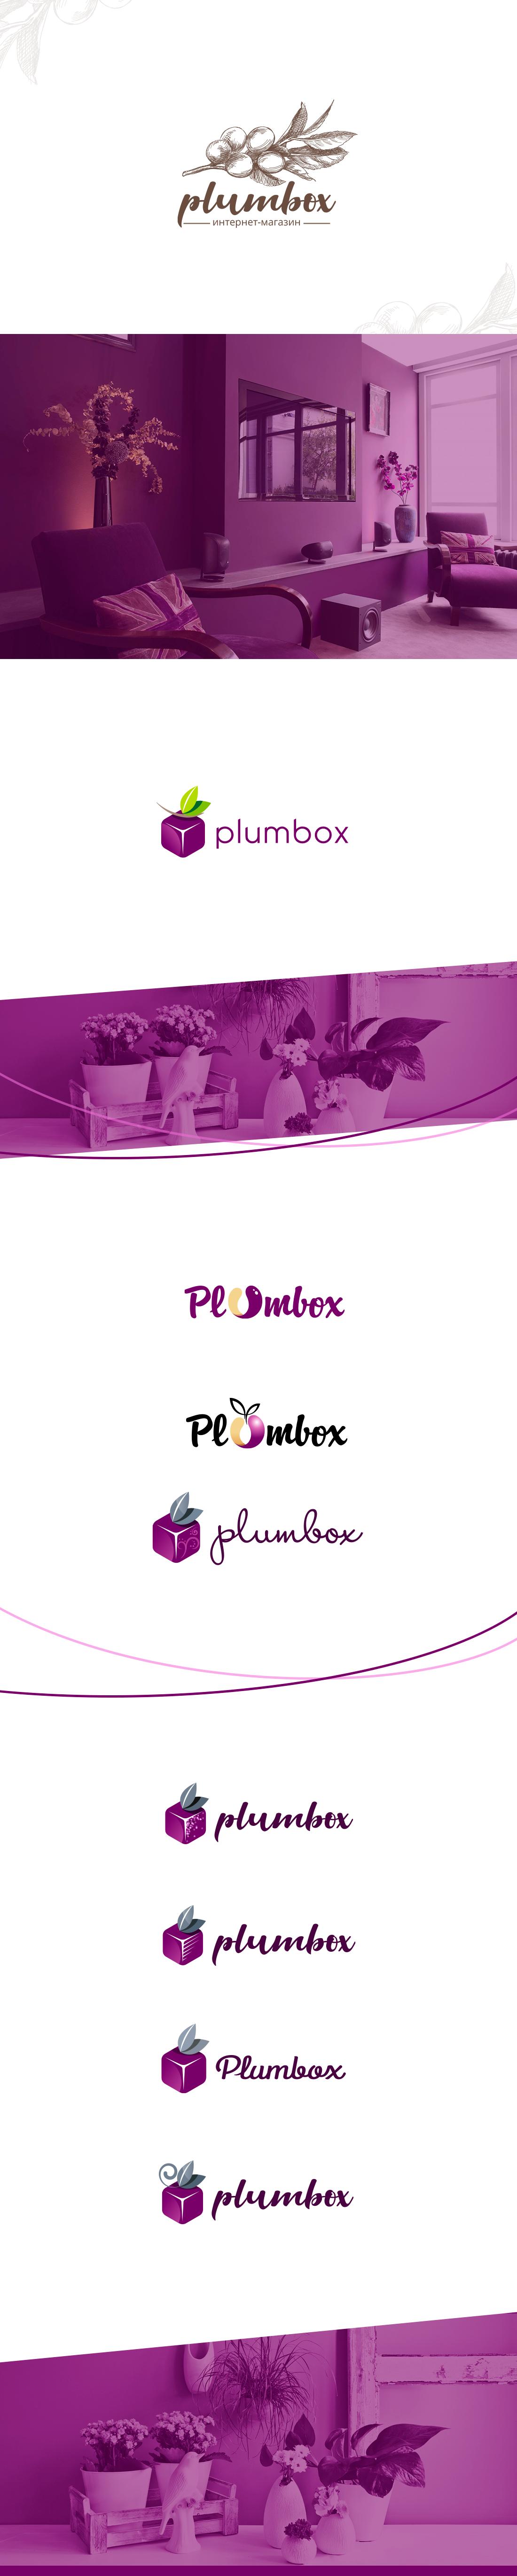 Plumbox - розничный интернет-магазин